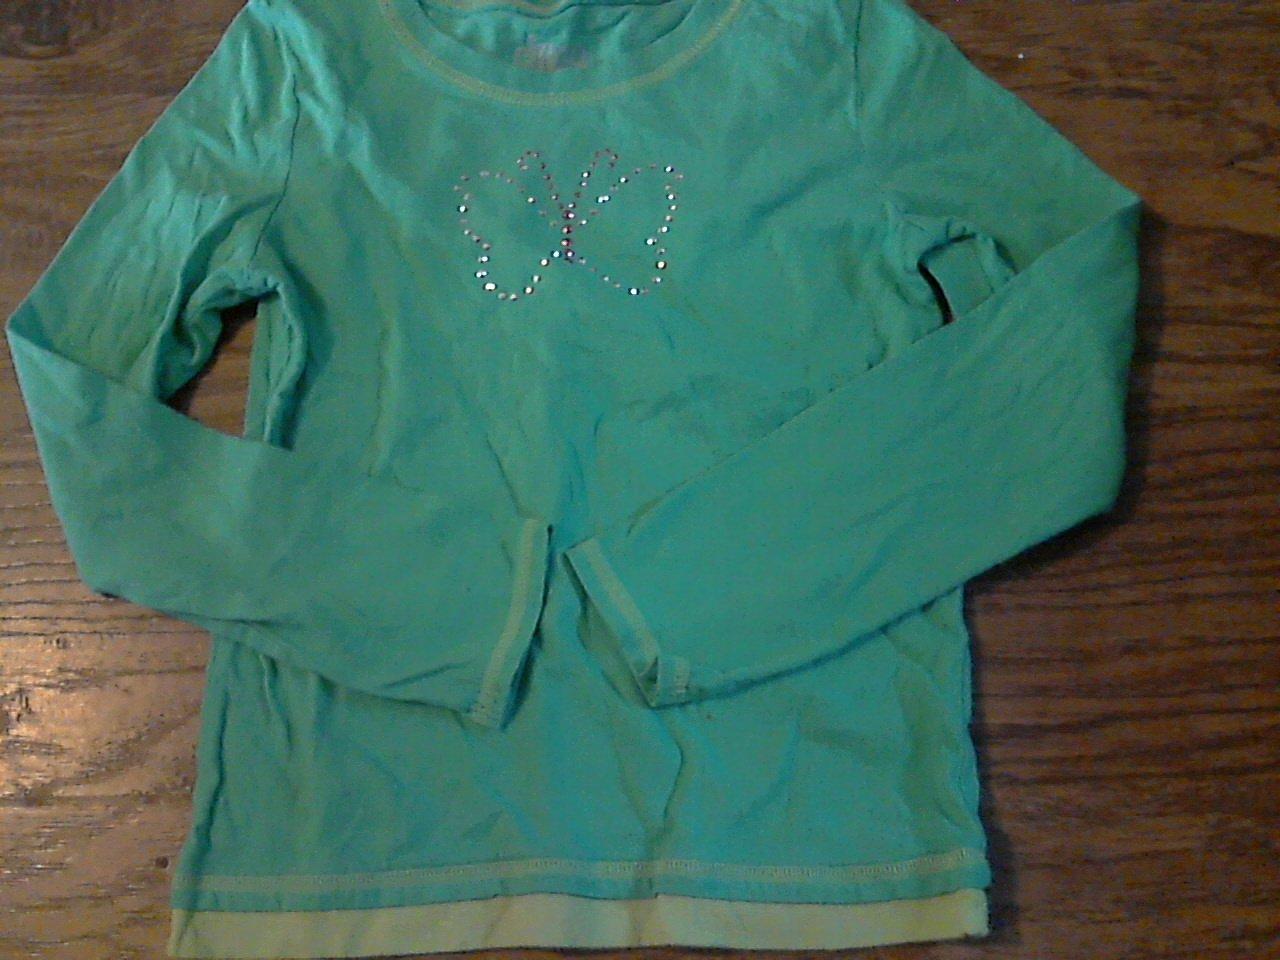 Circo girl's green long sleeve shirt size M (7-8)